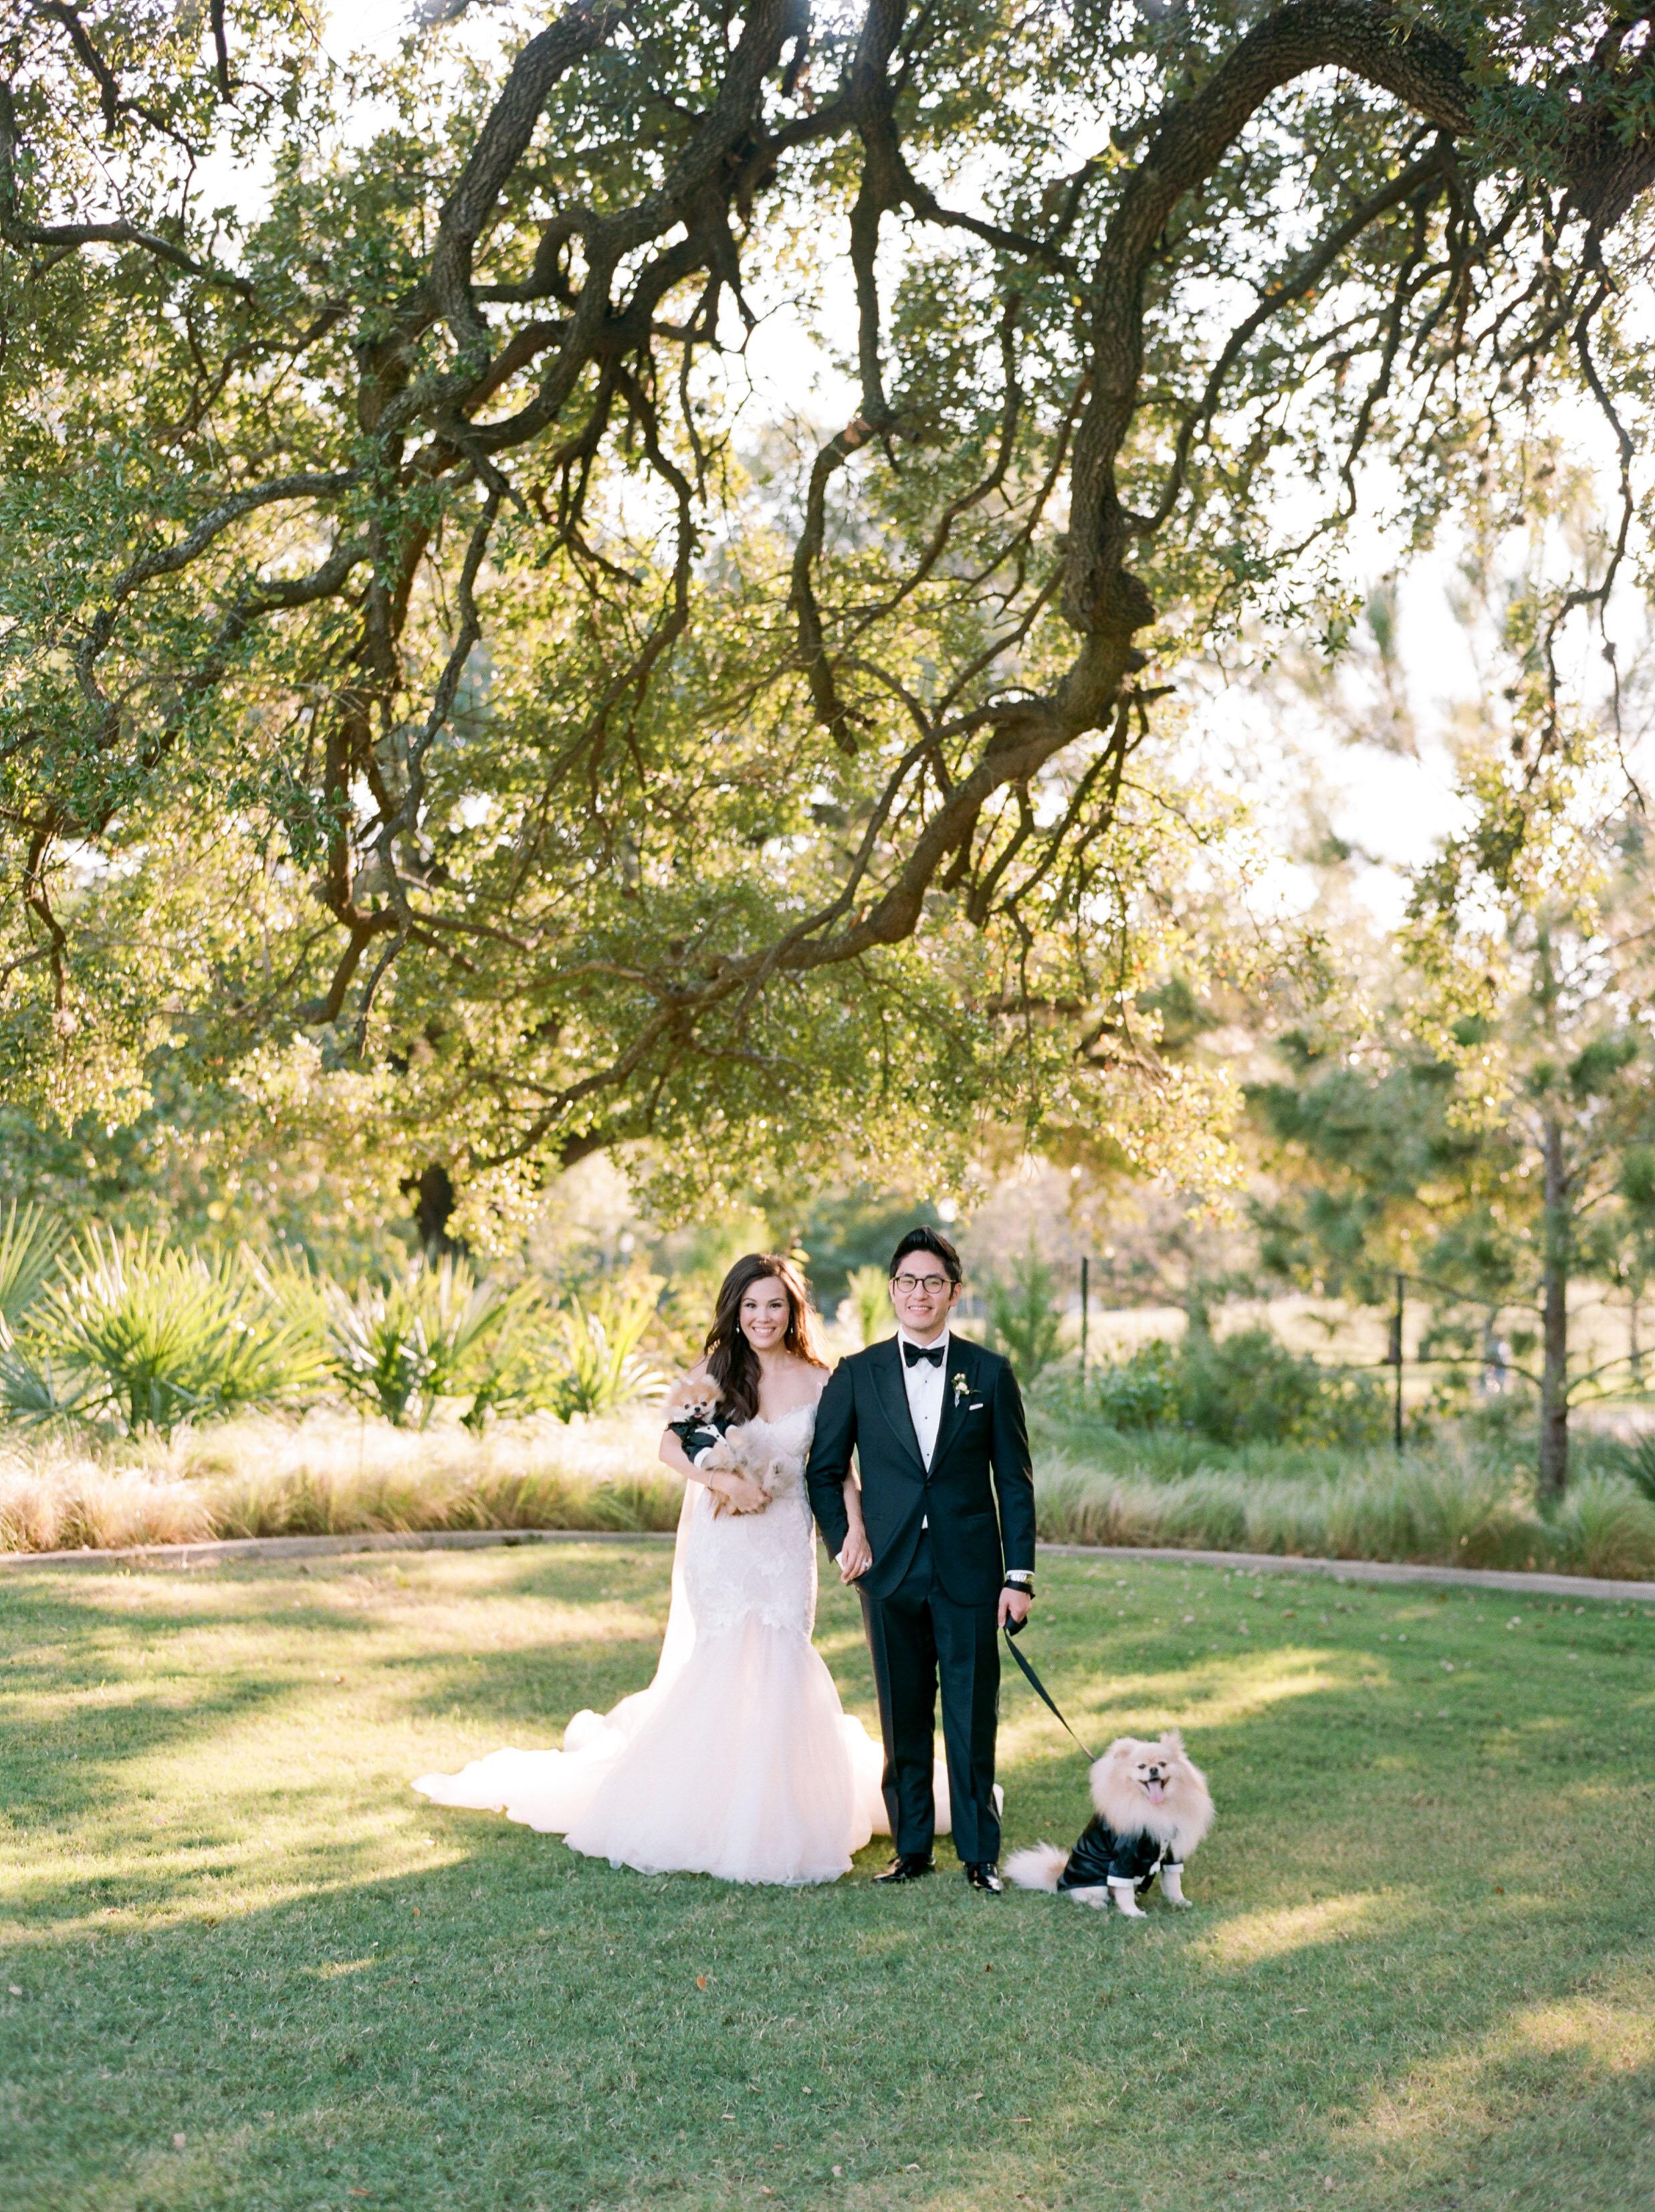 Martha-Stewart-Wedding-Dana-Fernandez-Photography-Josh-Texas-Film-Houston-Wedding-Fine-Art-Photographer-McGovern-Centennial-Gardens-Top-Best-64.jpg